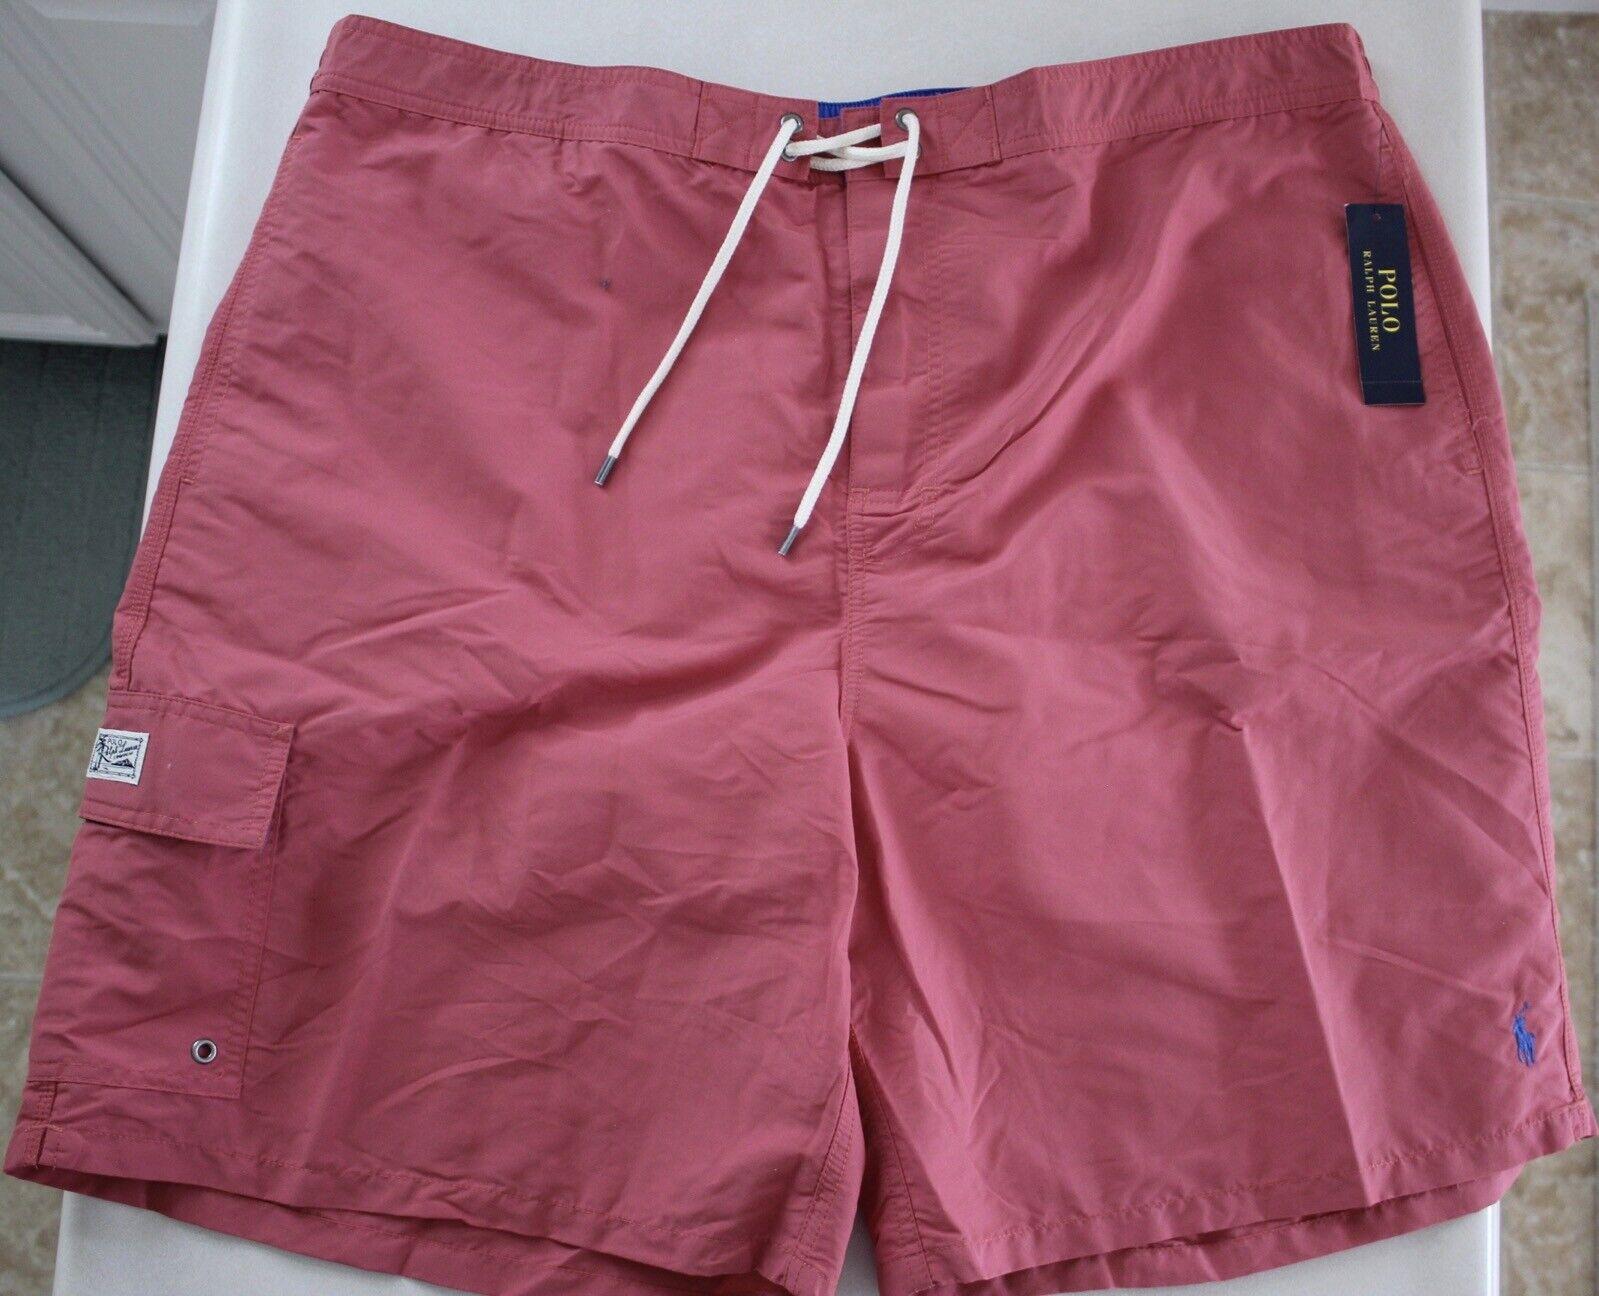 Polo Ralph Lauren Men's Swim Trunk Board Shorts size 3XB 3G New